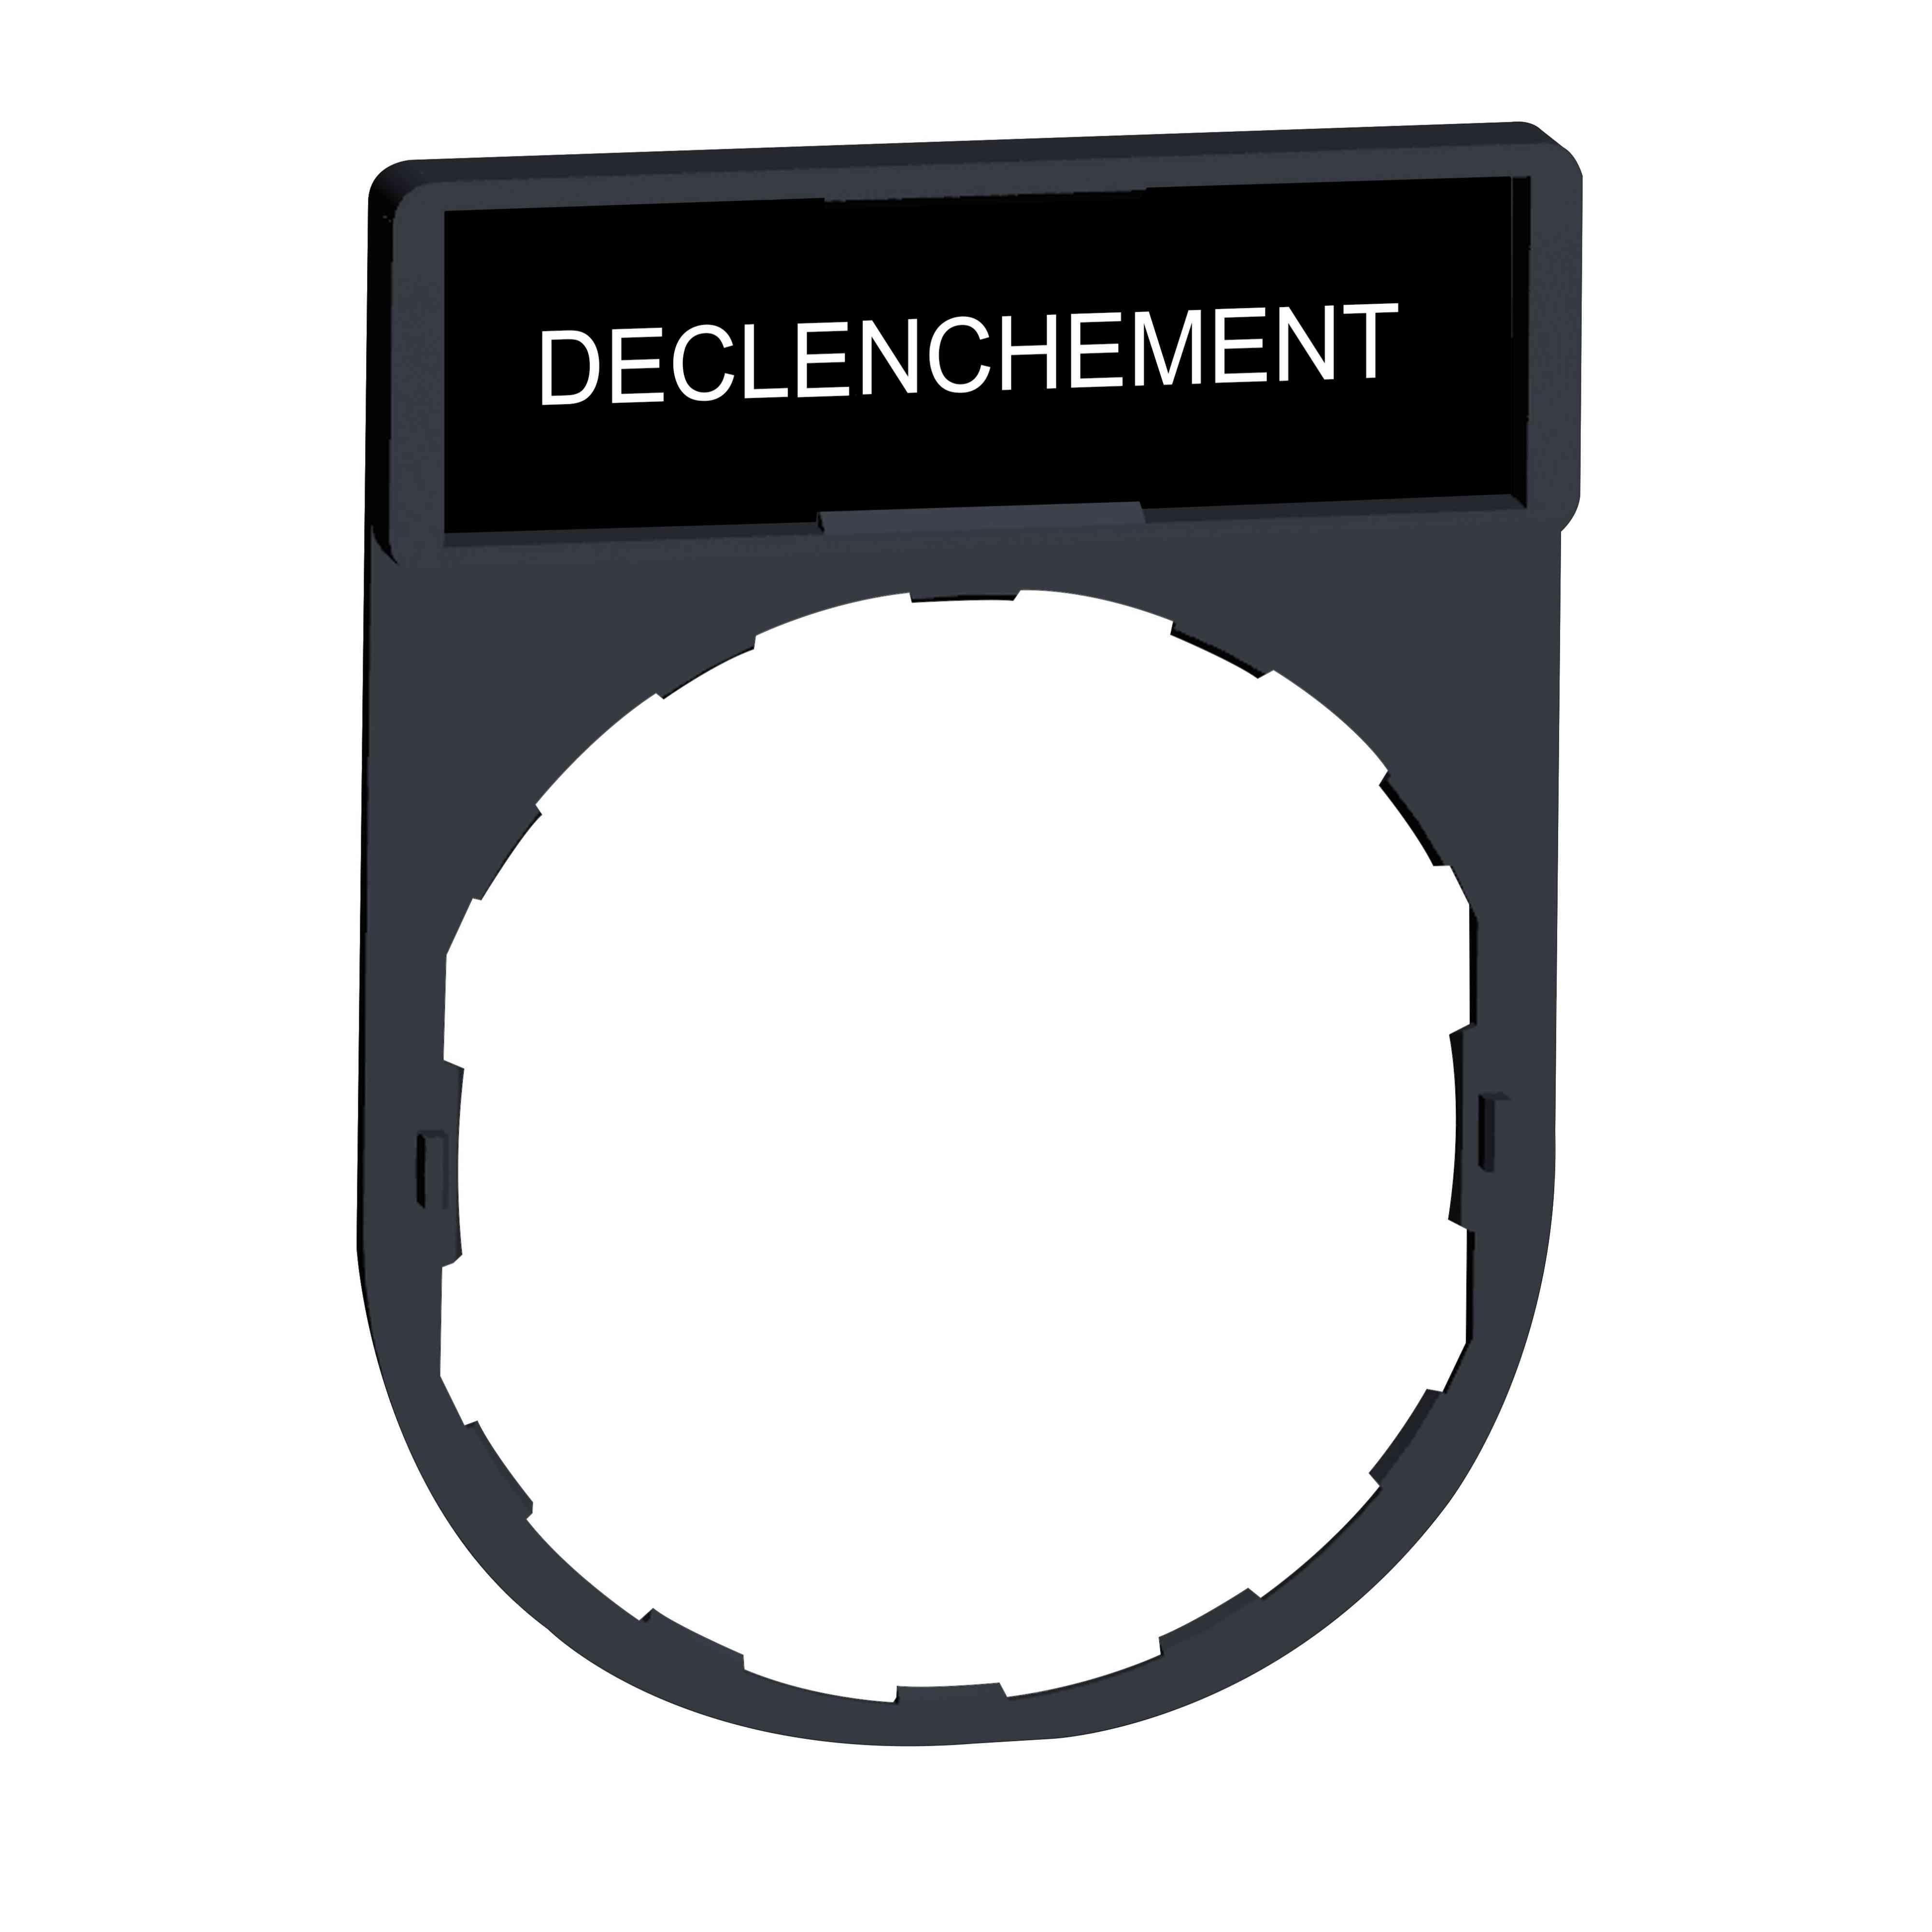 Nosilec legende 30 x 40 mm z legendo 8 x 27 mm z oznako DECLENCHEMENT